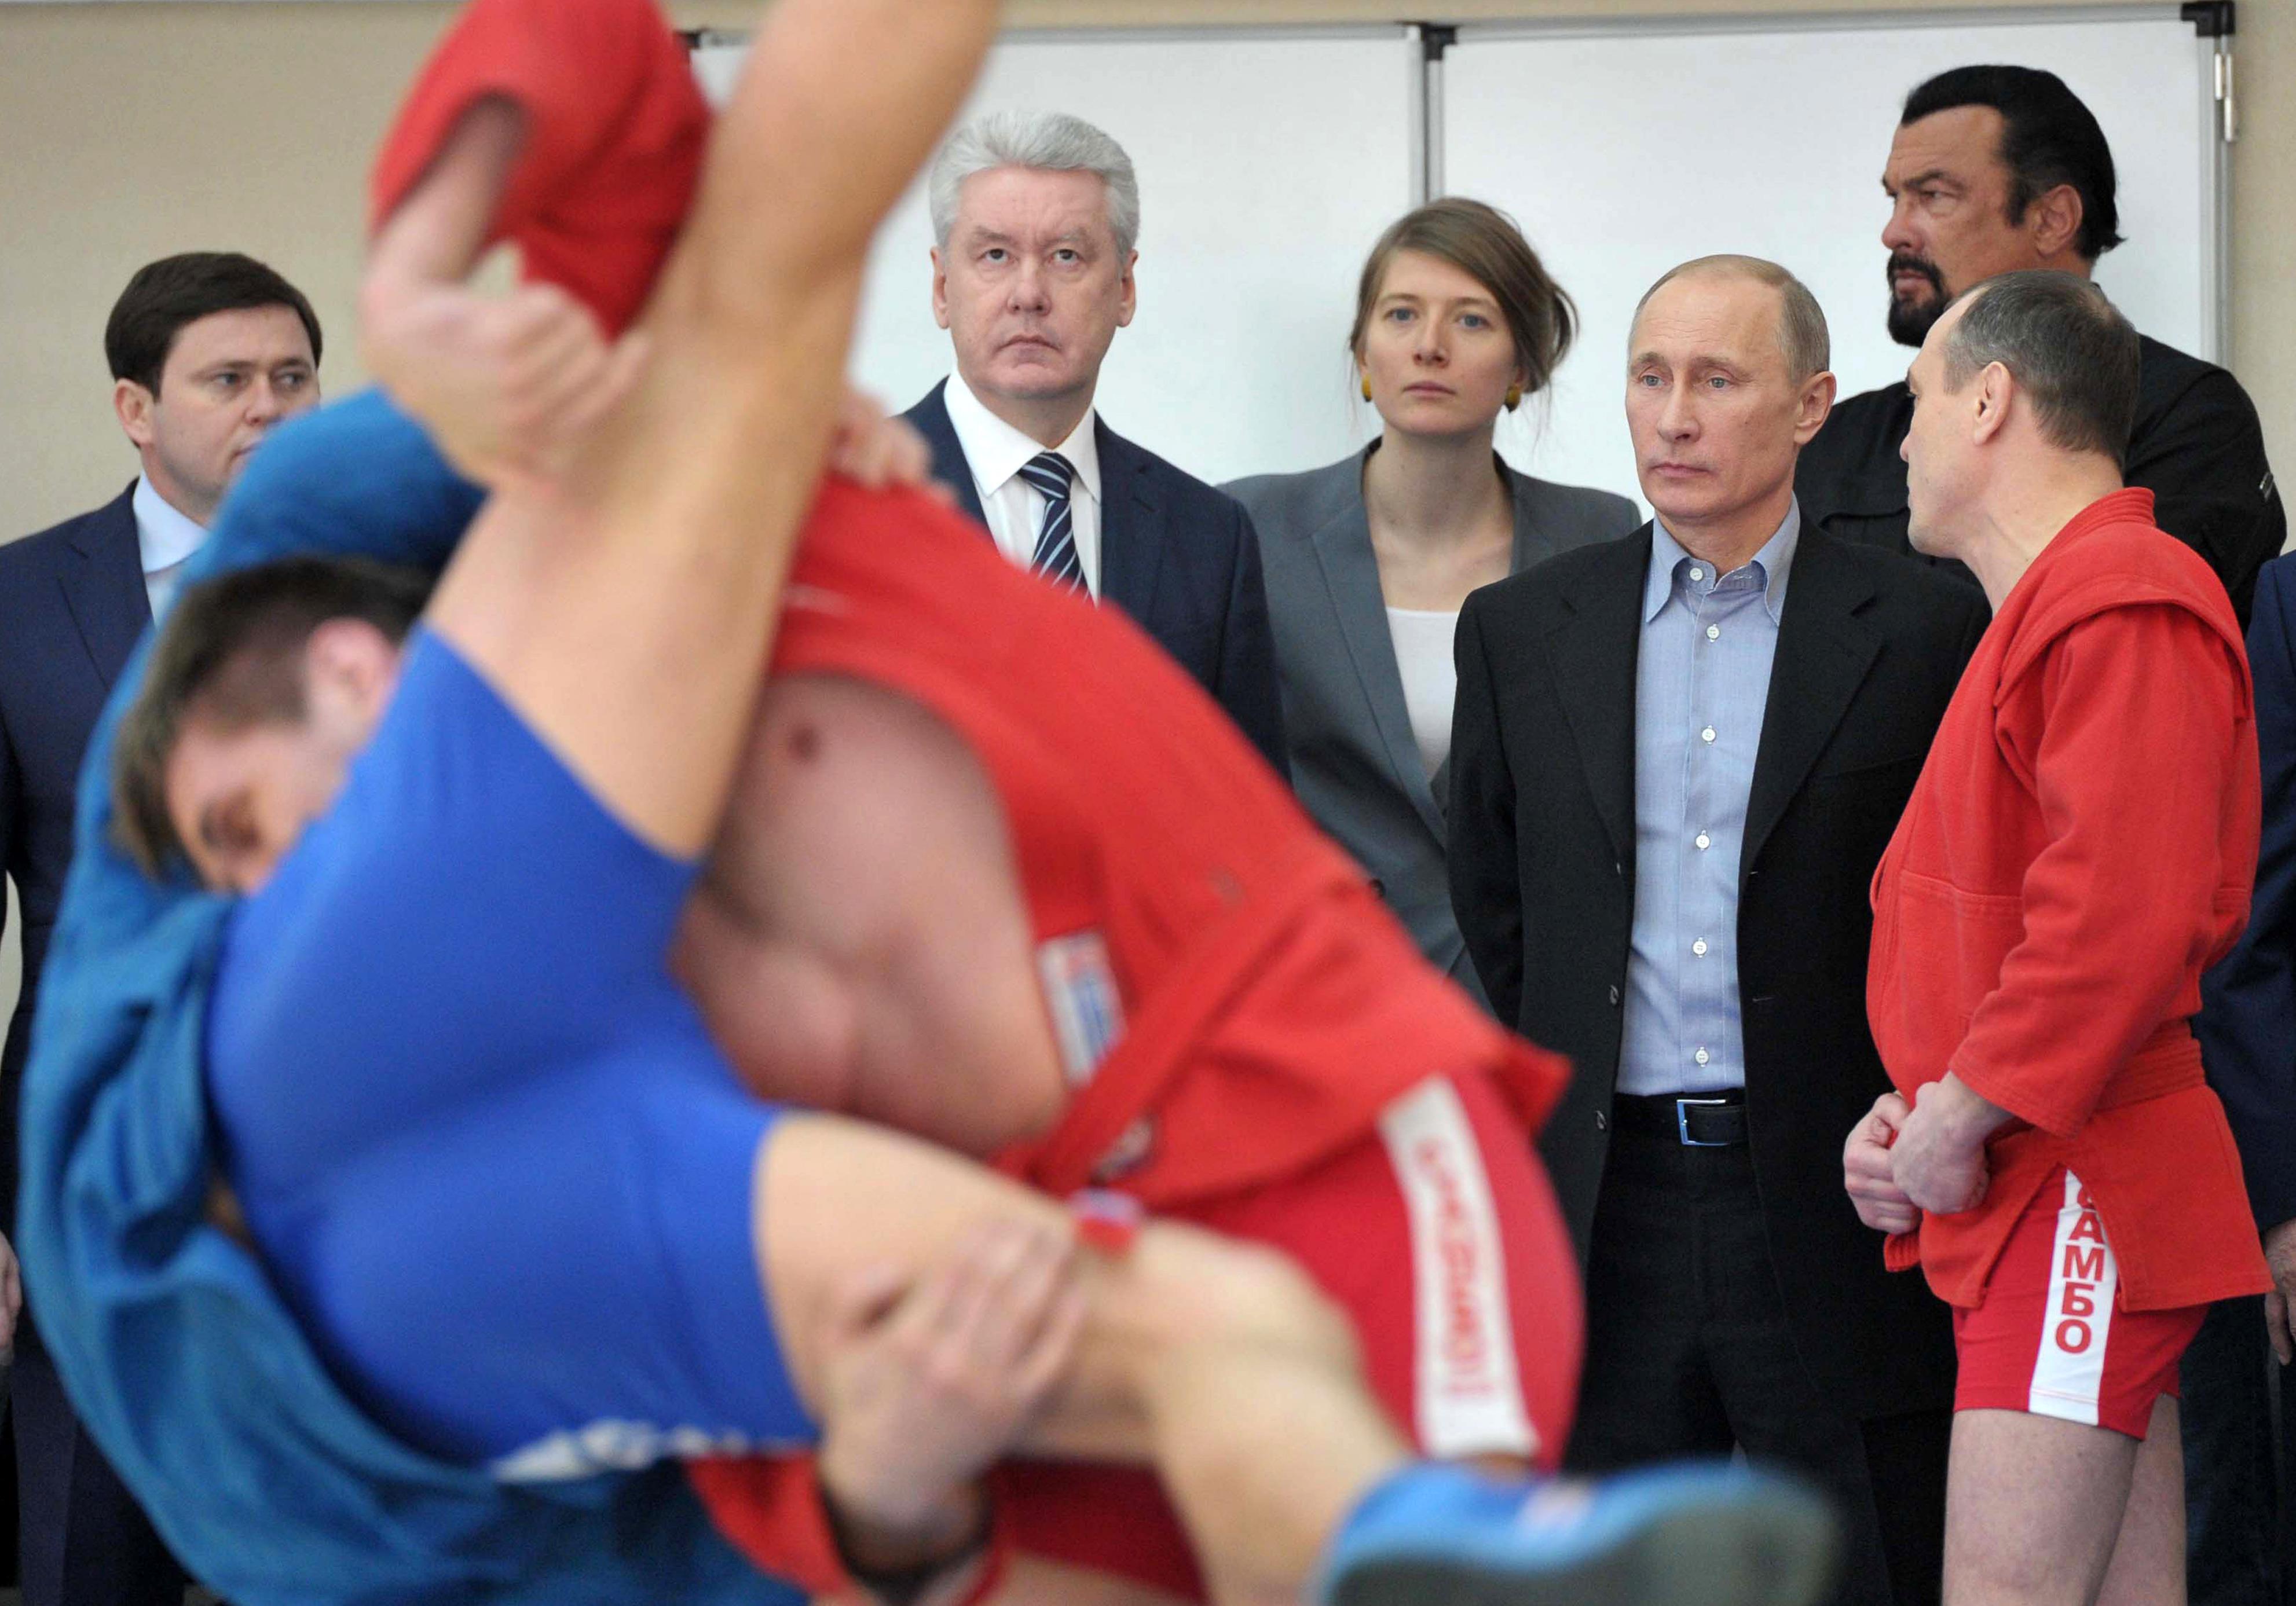 Vladimir Putin, Steven Seagal watch martial arts